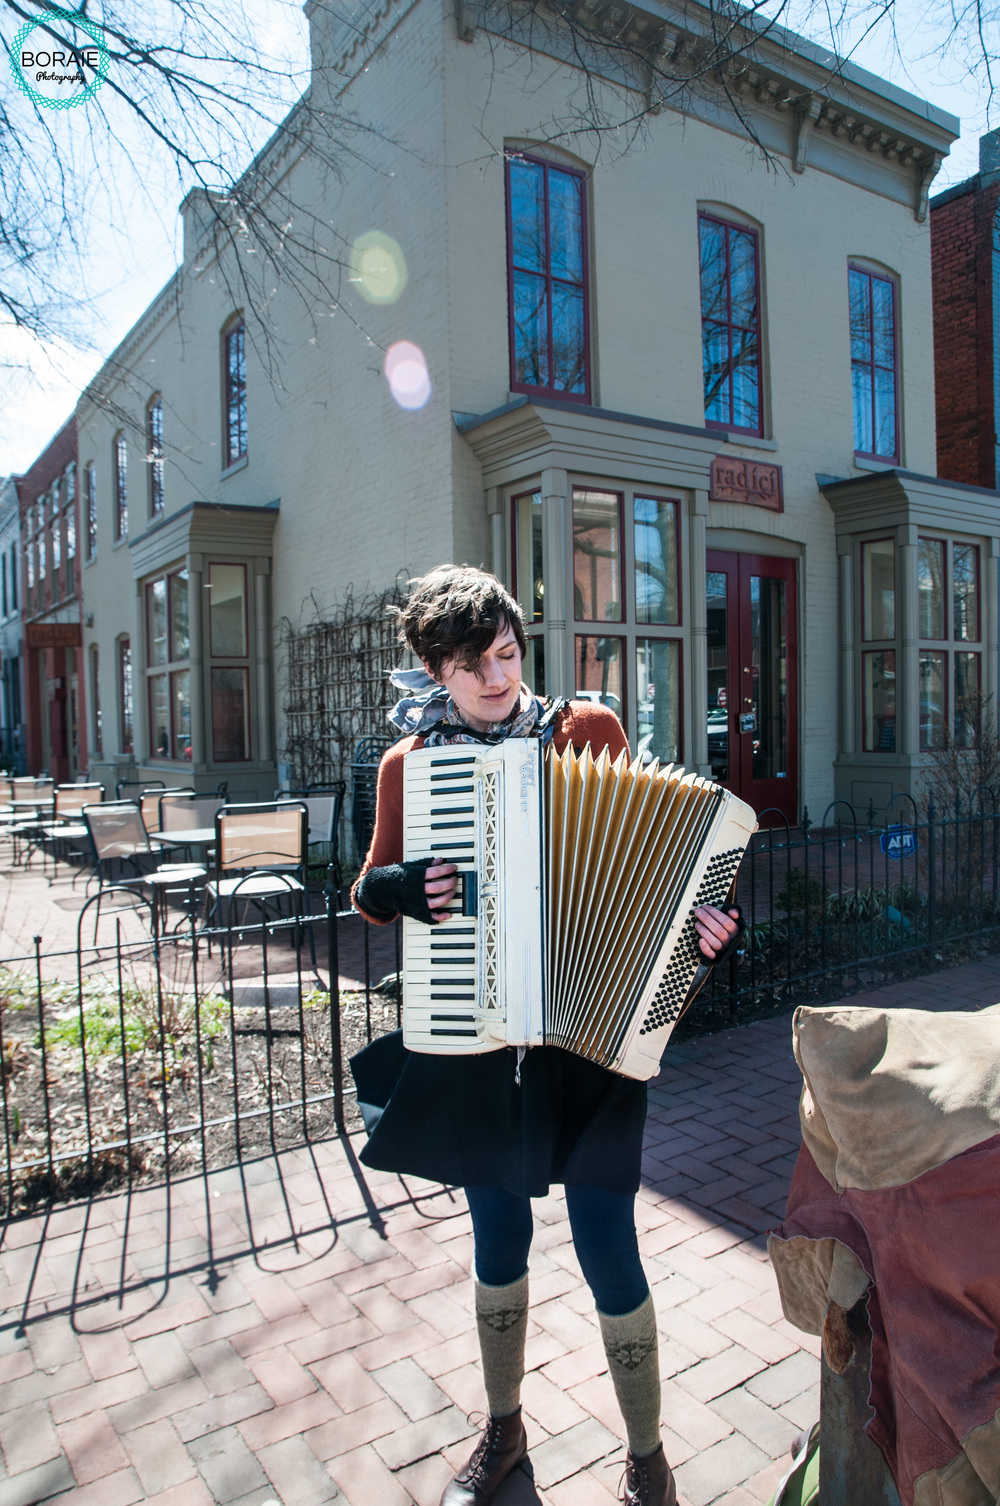 Boraie Photography - VA MD DC - (www.boraiephotography.com )-1.JPG